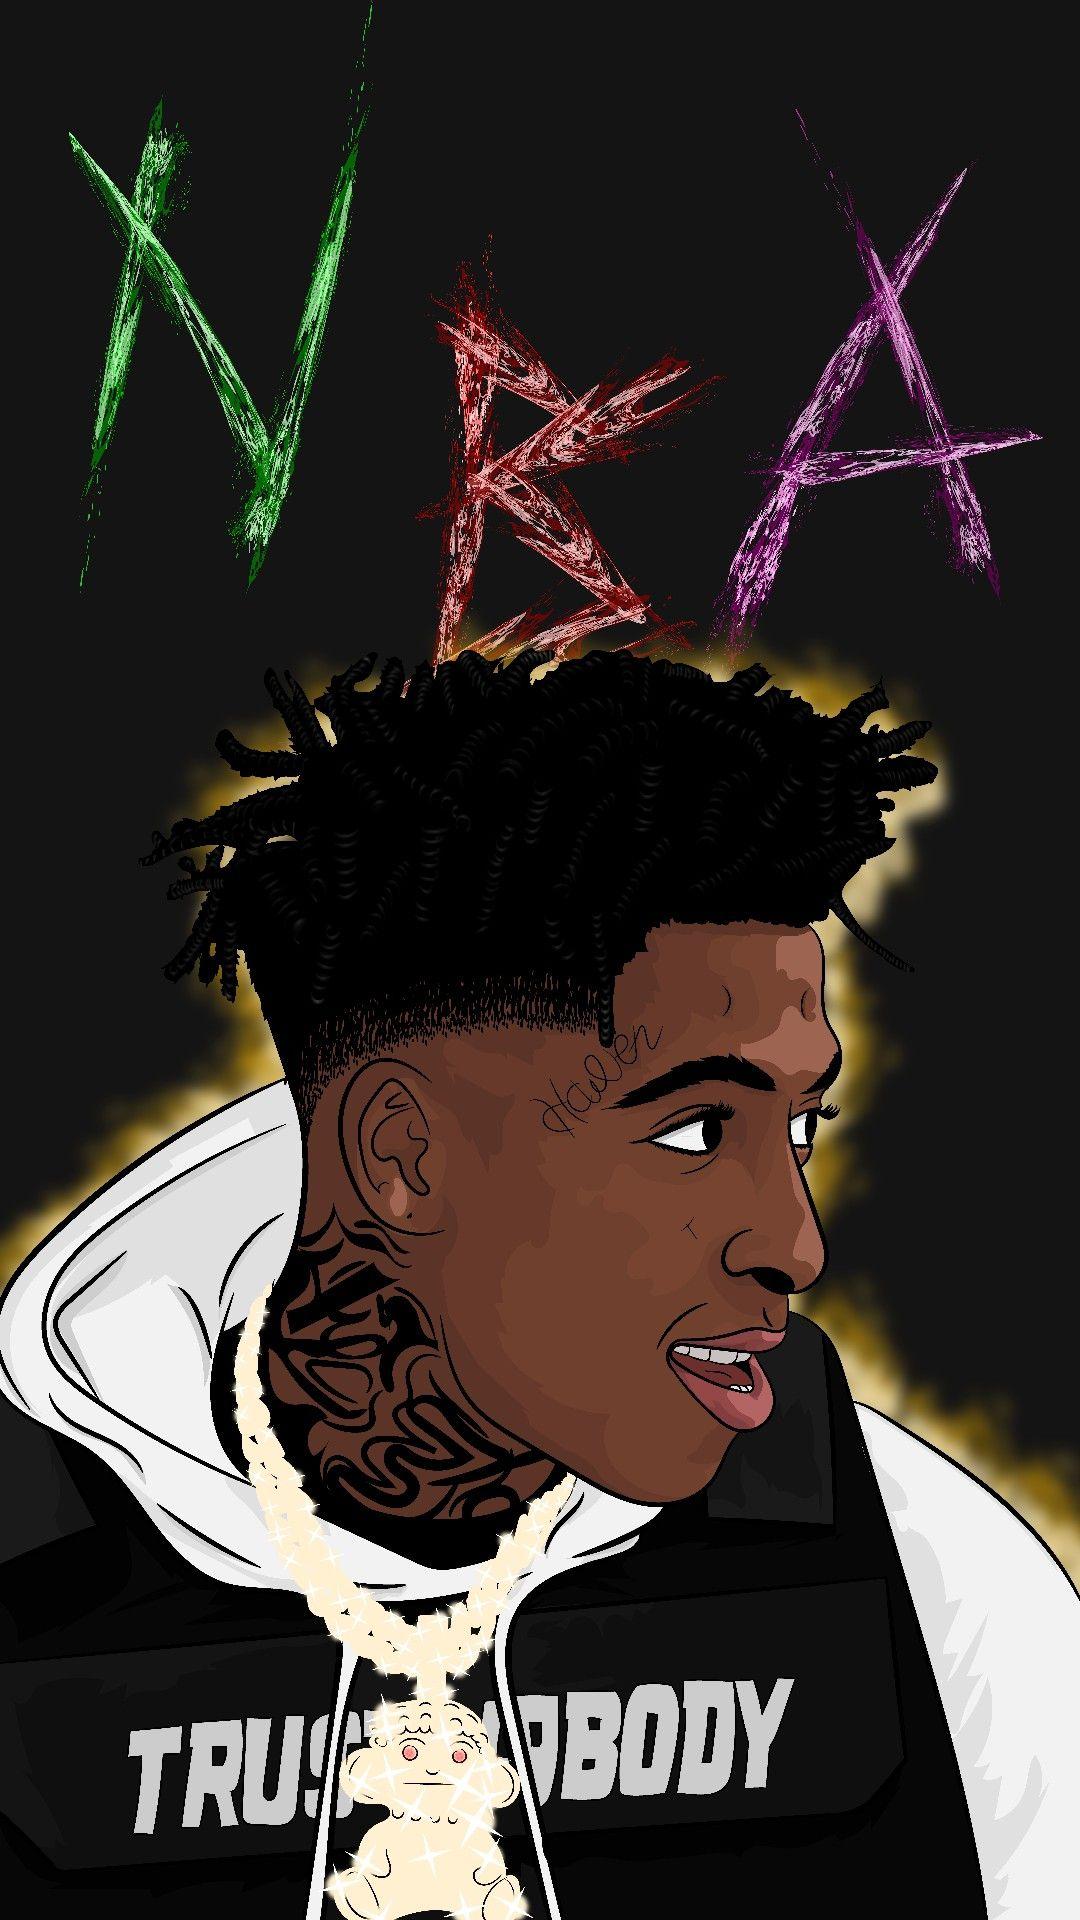 Cartoon Nba Youngboy Im Drawing Many Cartoon People Just Check My Work Cartoon Art Drawing Cartoon People Rapper Art